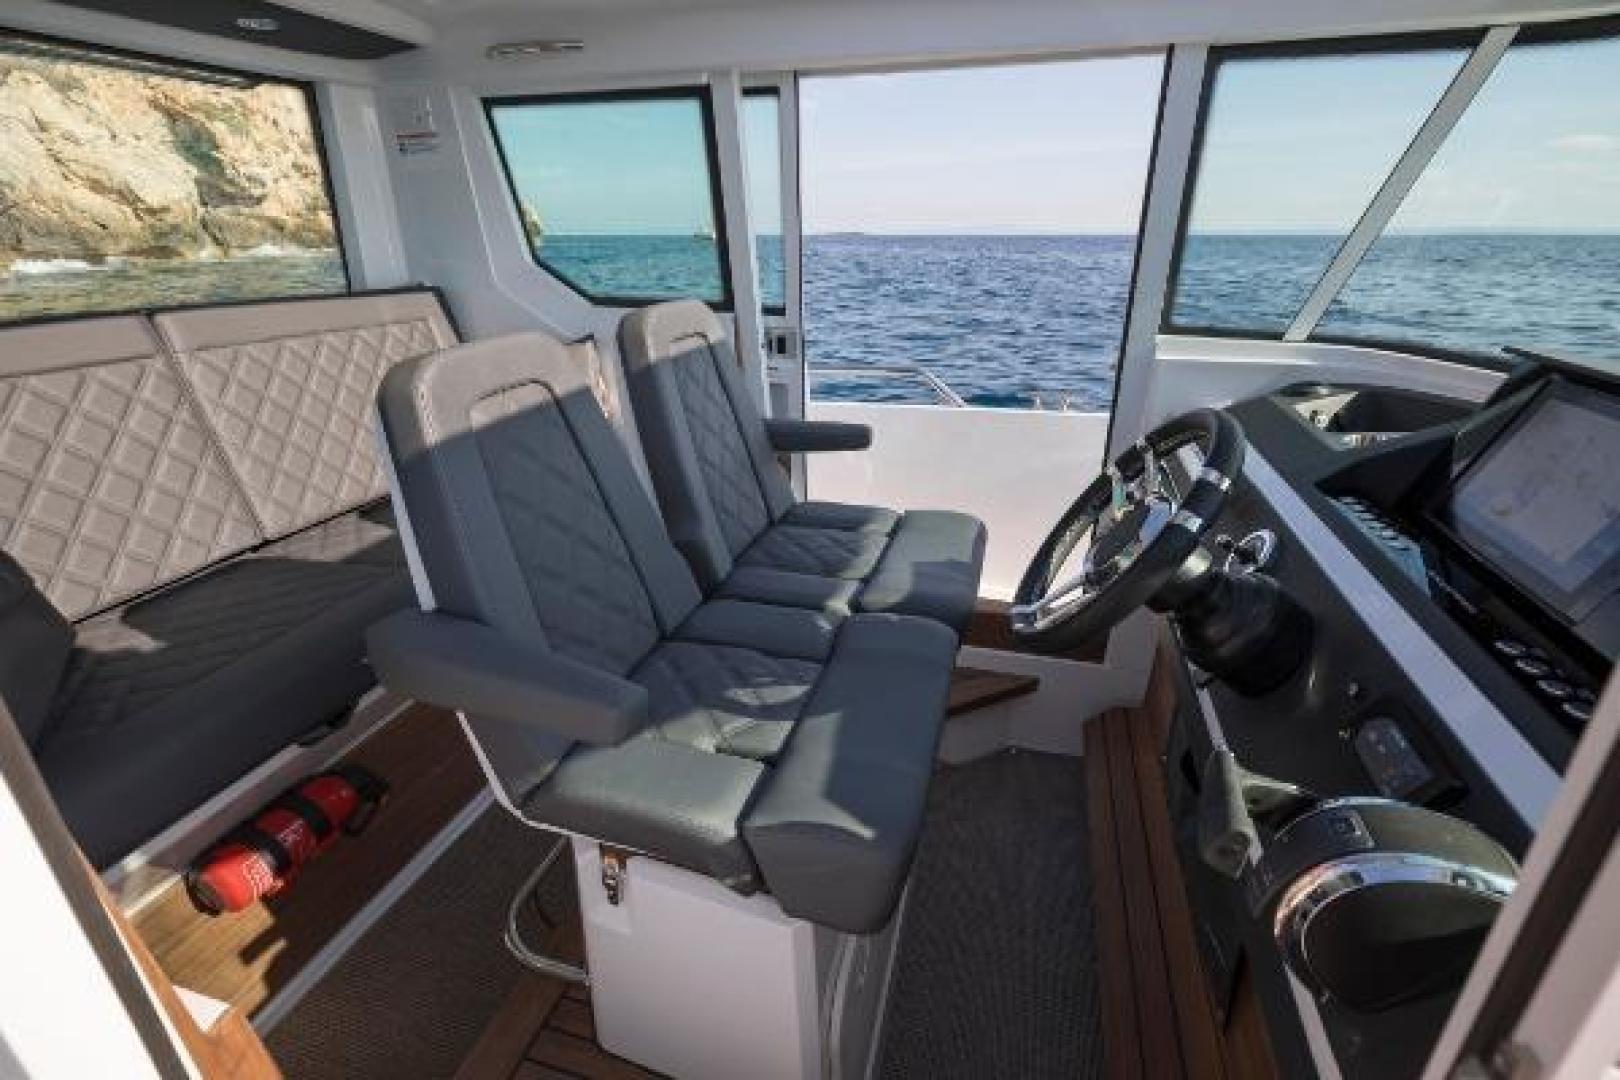 Axopar-28 CABIN 2020-Axopar 28 CABIN Fort Lauderdale-Florida-United States-1531670   Thumbnail